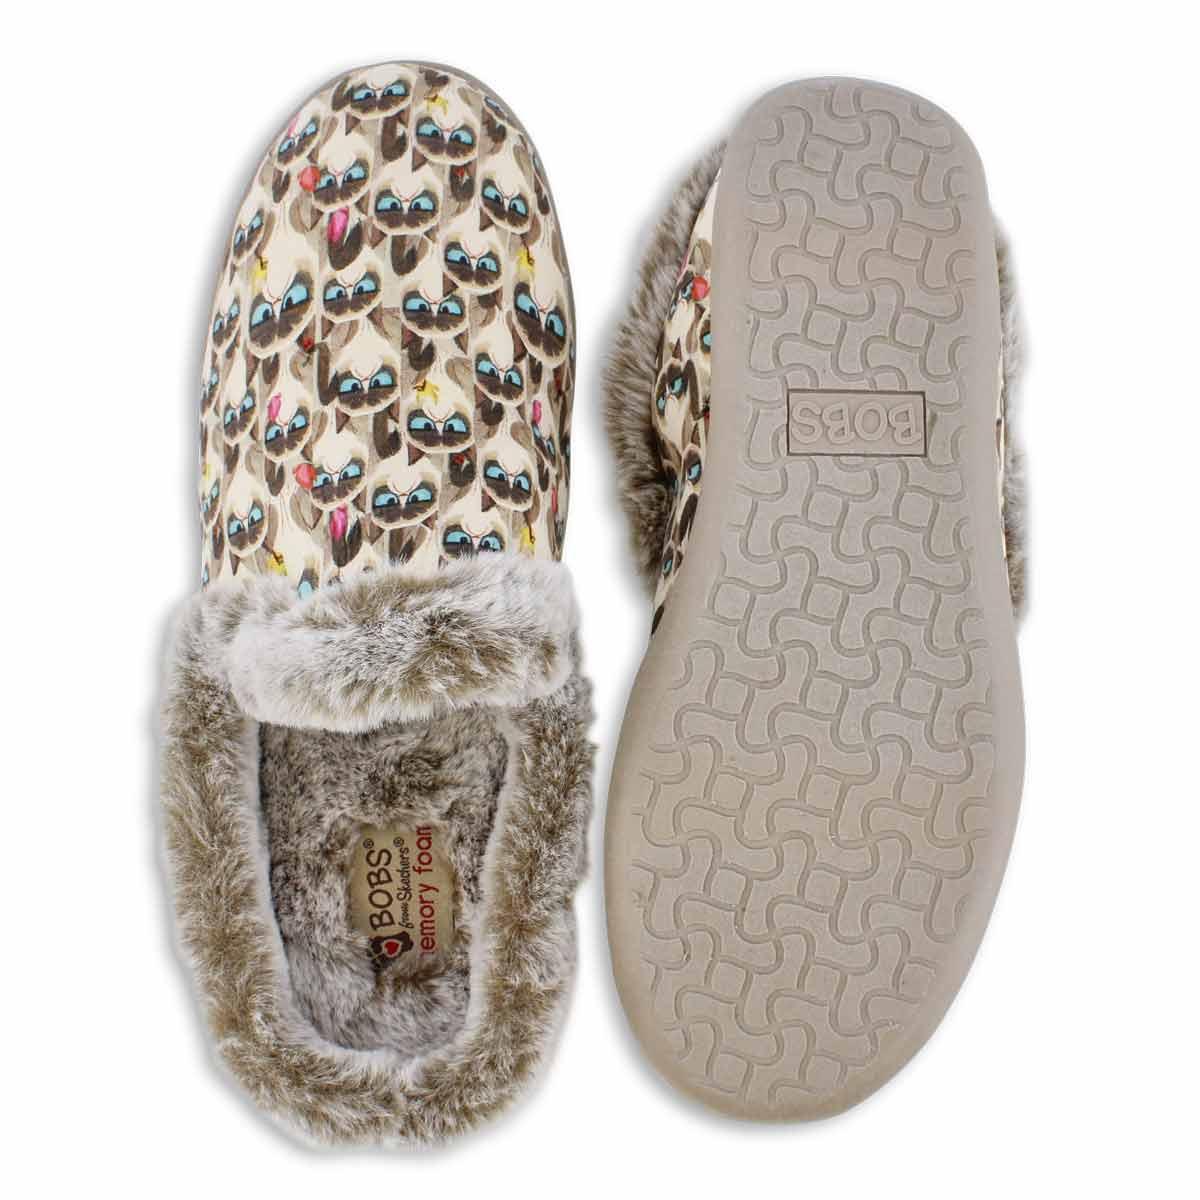 Lds Bobs Beach Bonfire tpe/multi slipper